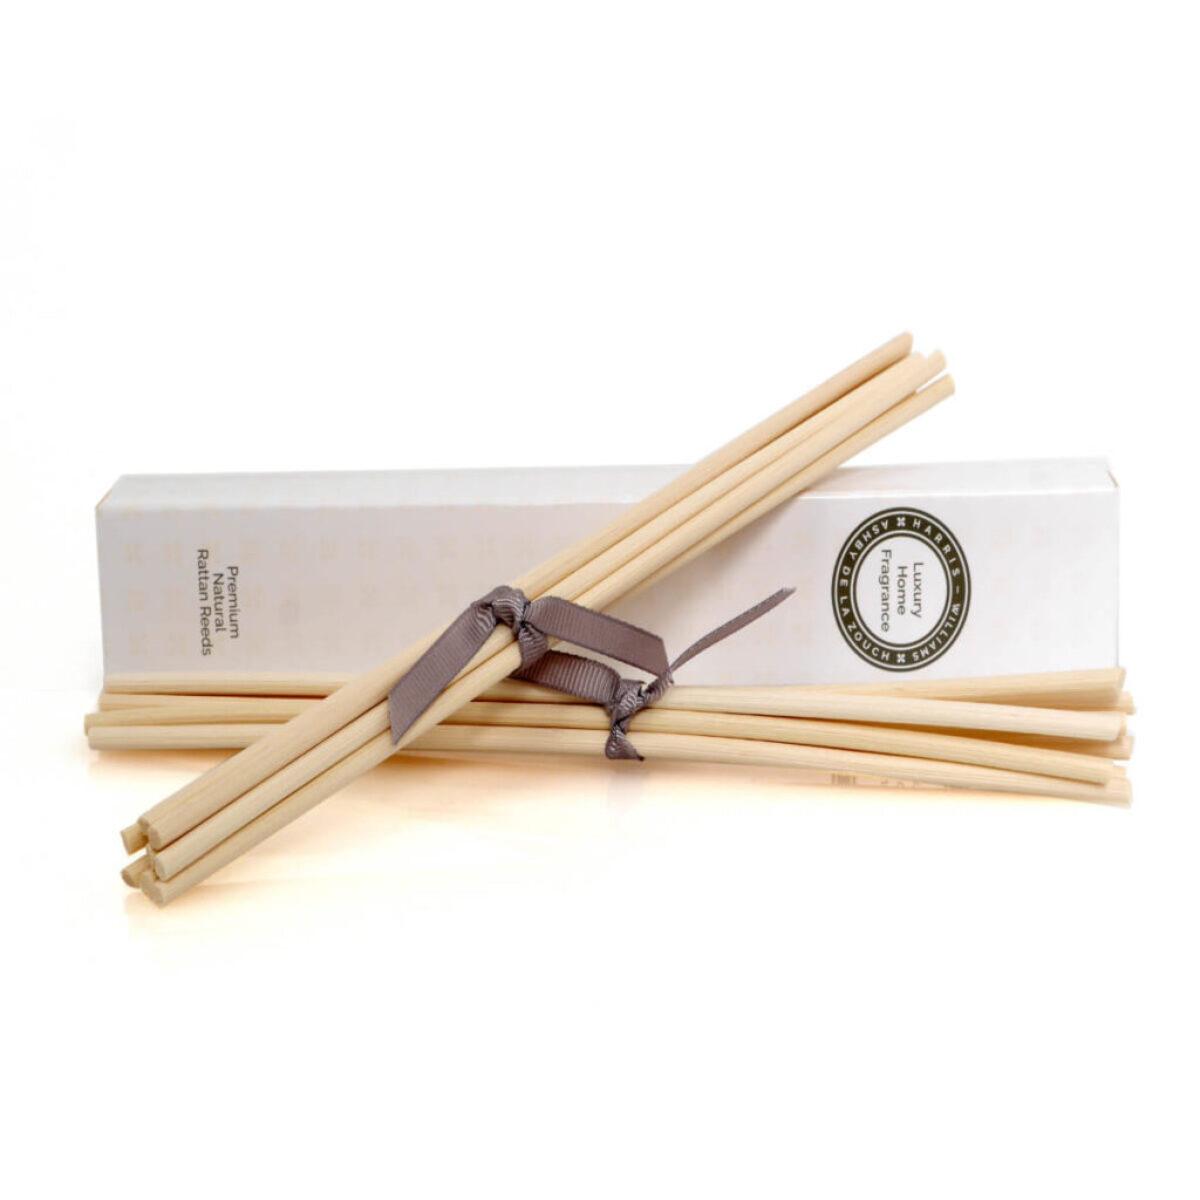 Premium Natural Rattan Reeds 2 Bundles